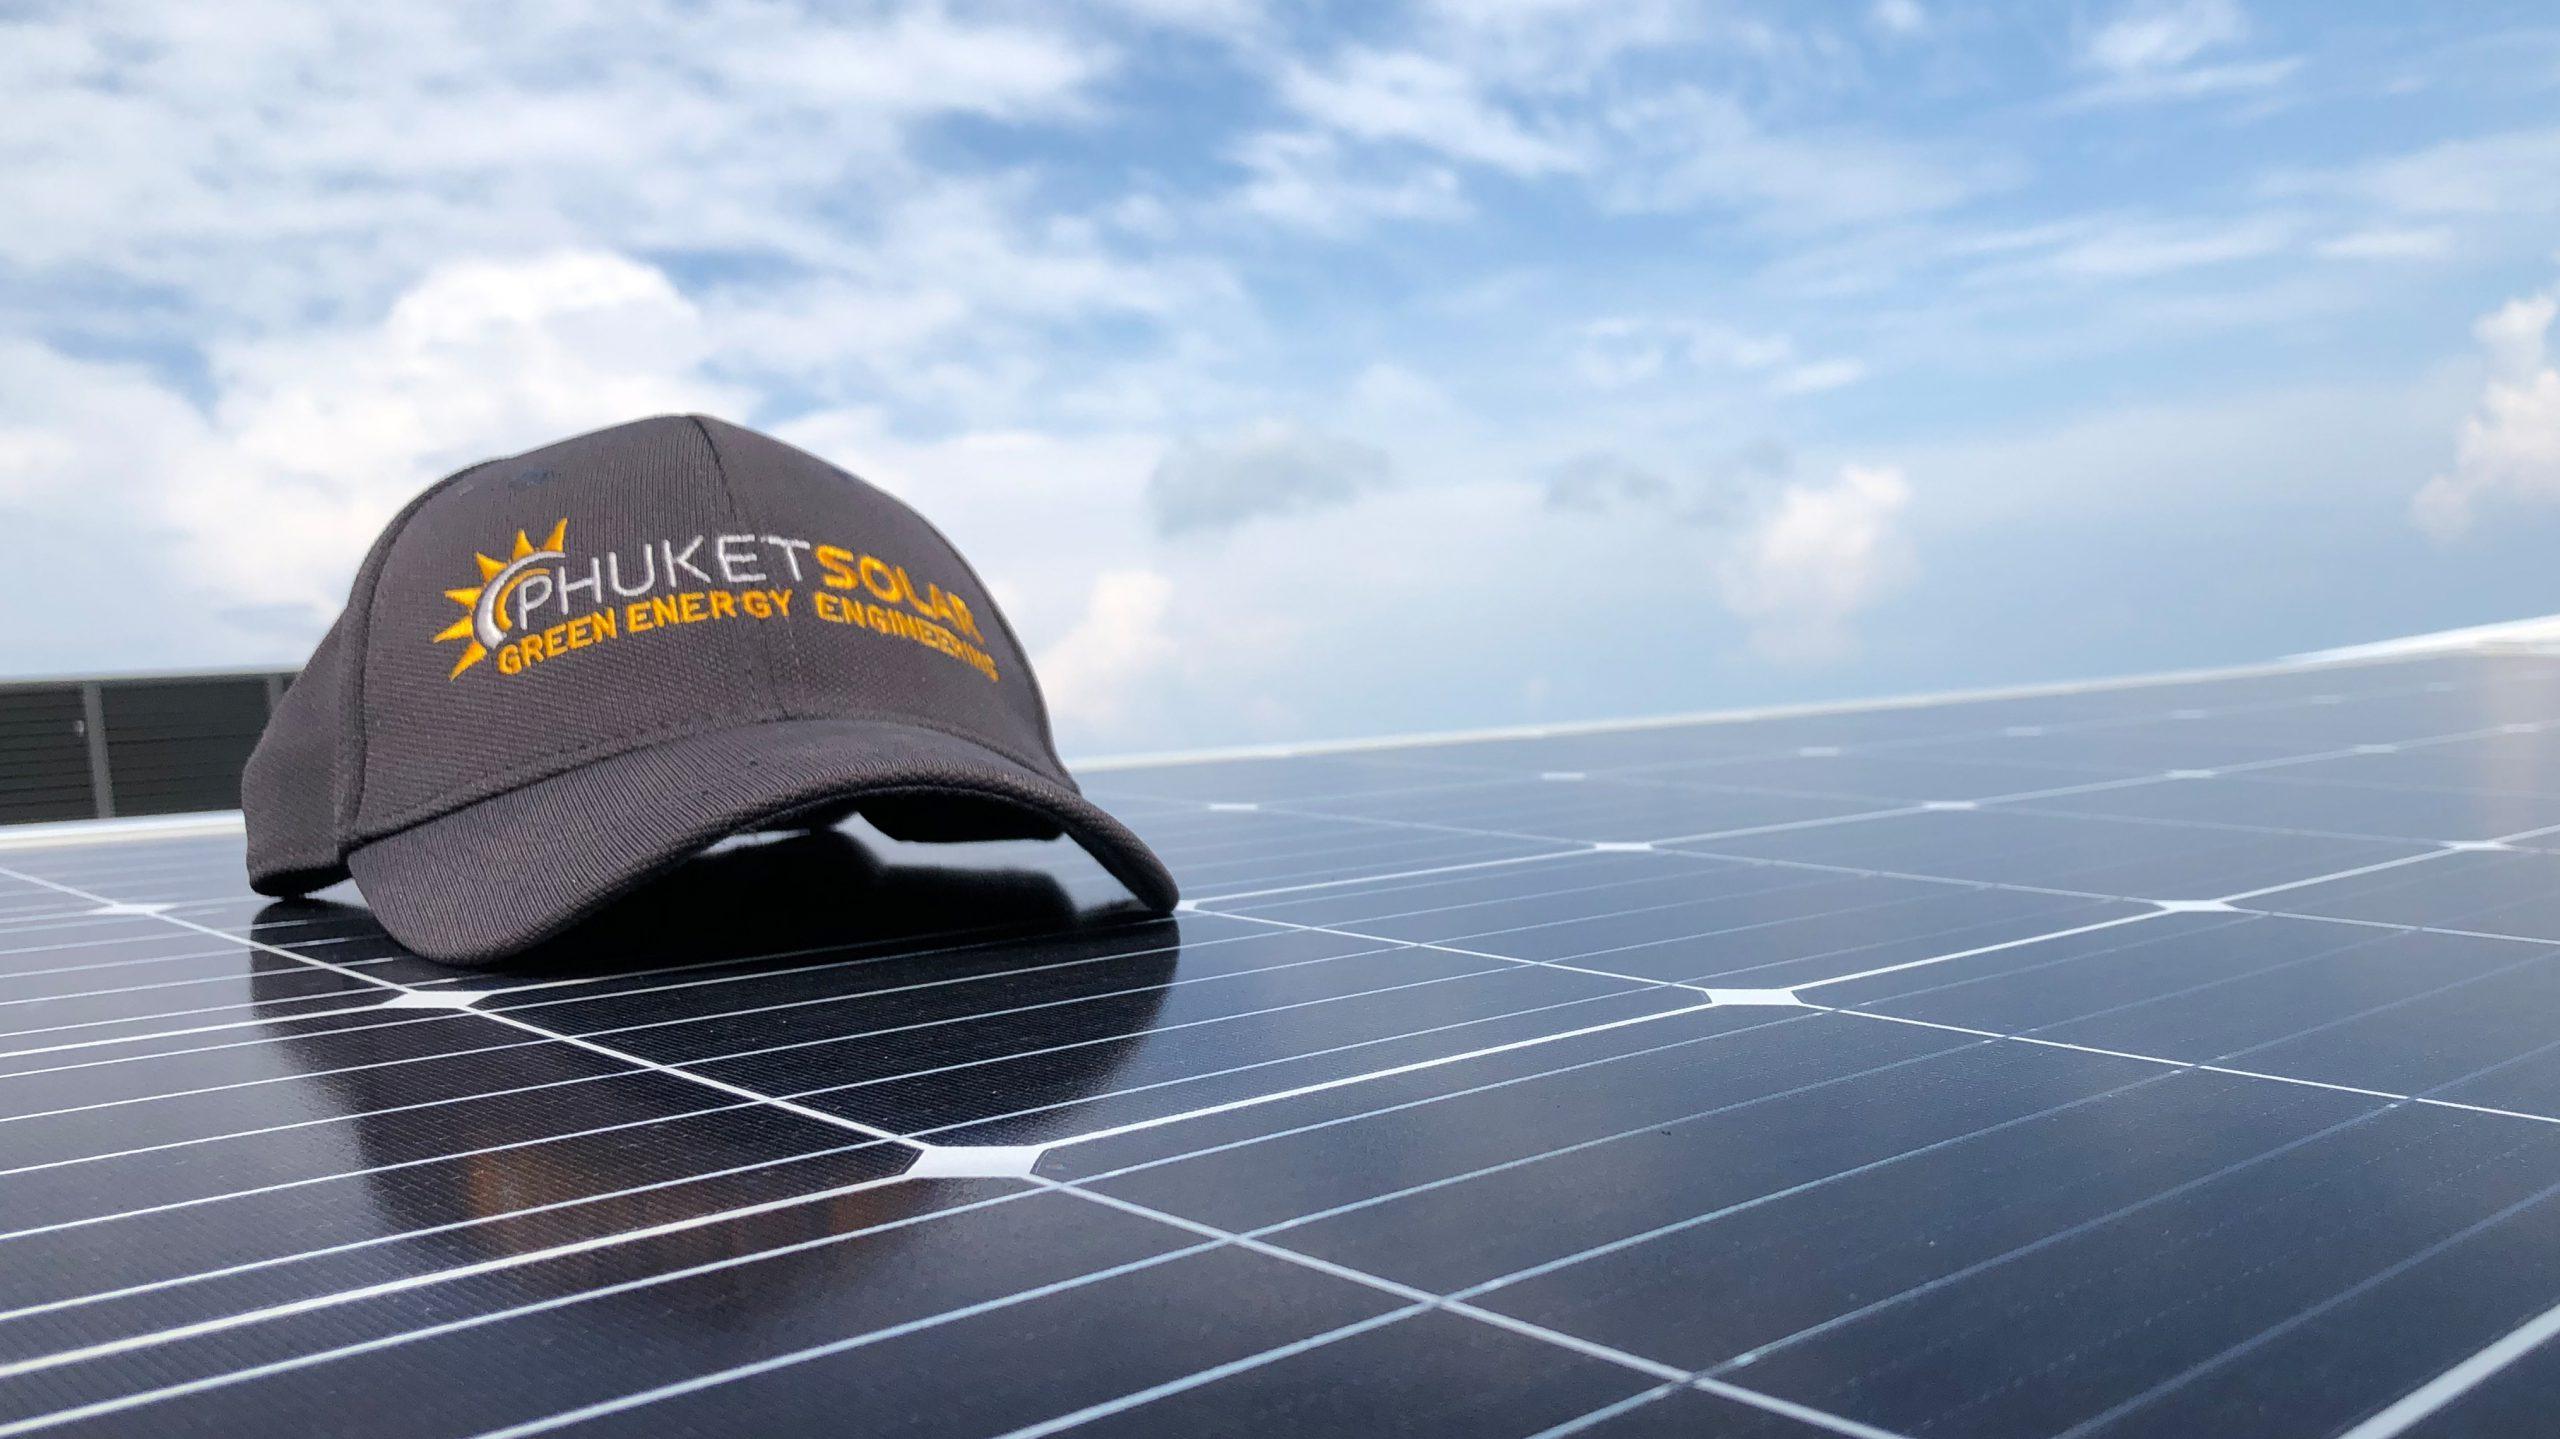 Phuket Solar Co., Ltd.